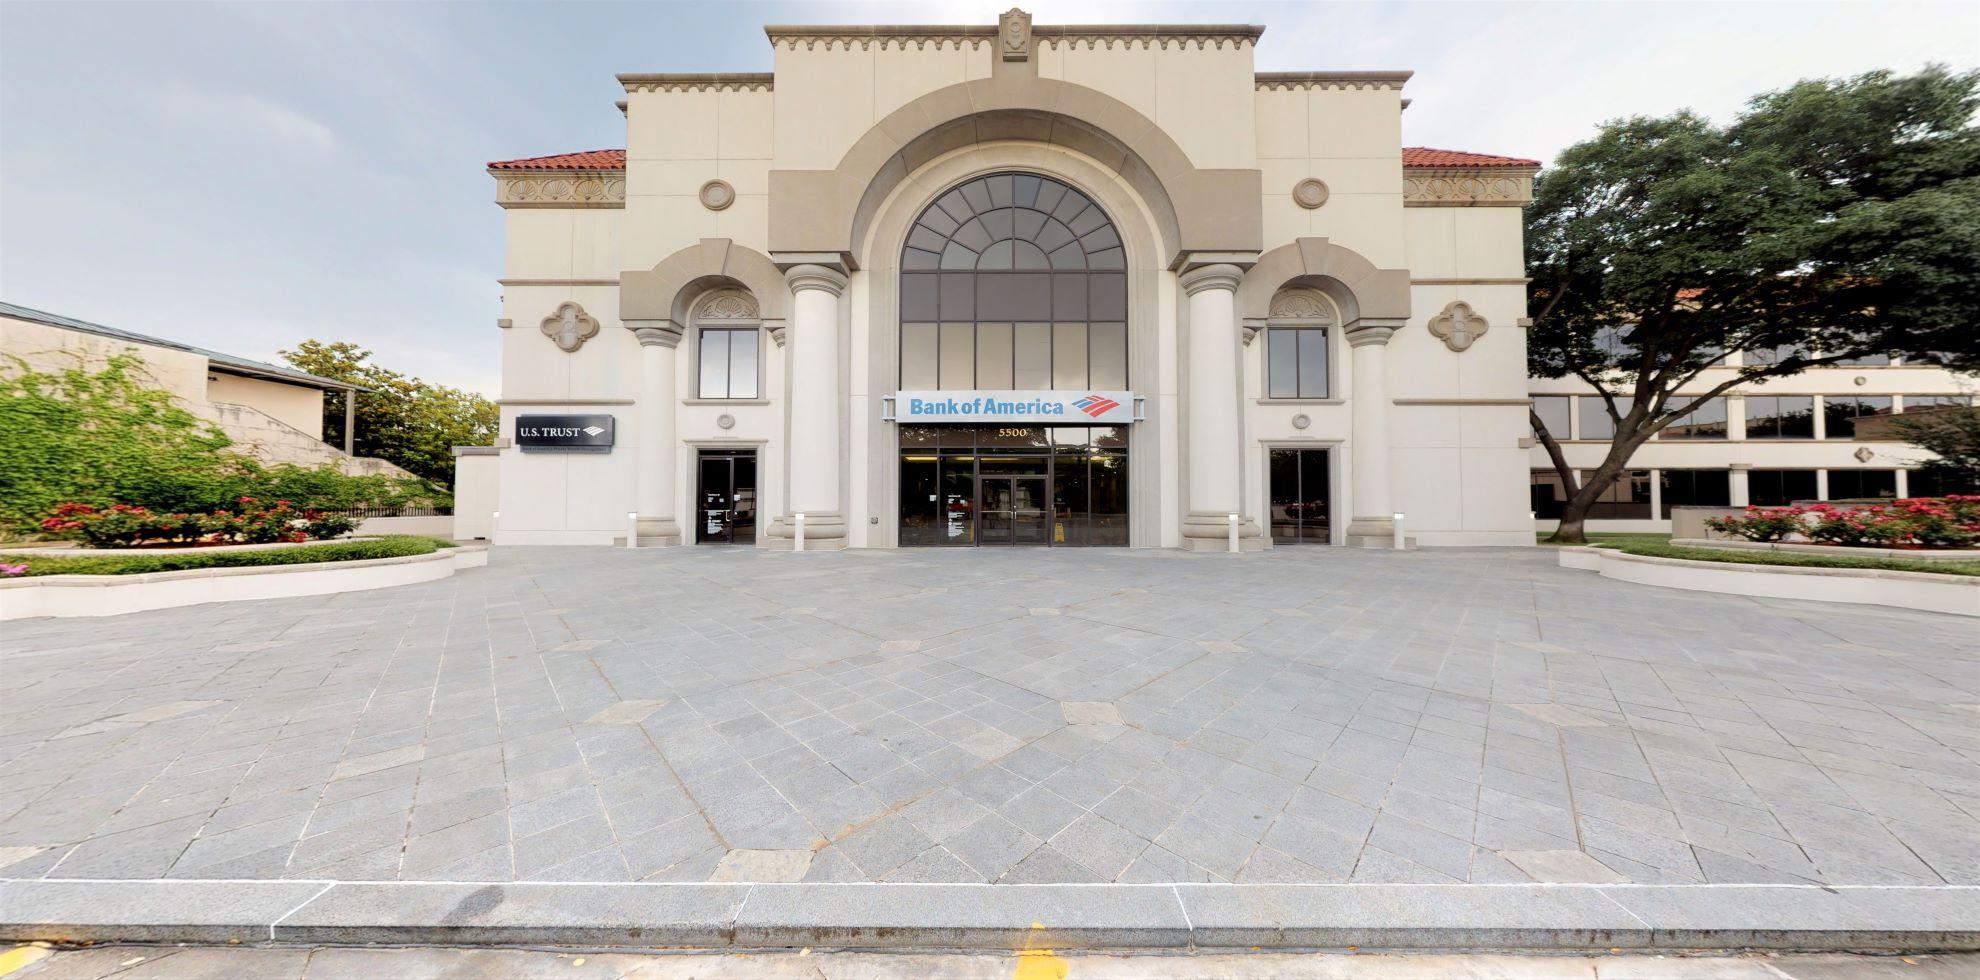 Bank of America financial center with walk-up ATM | 5500 Preston Rd, Dallas, TX 75205